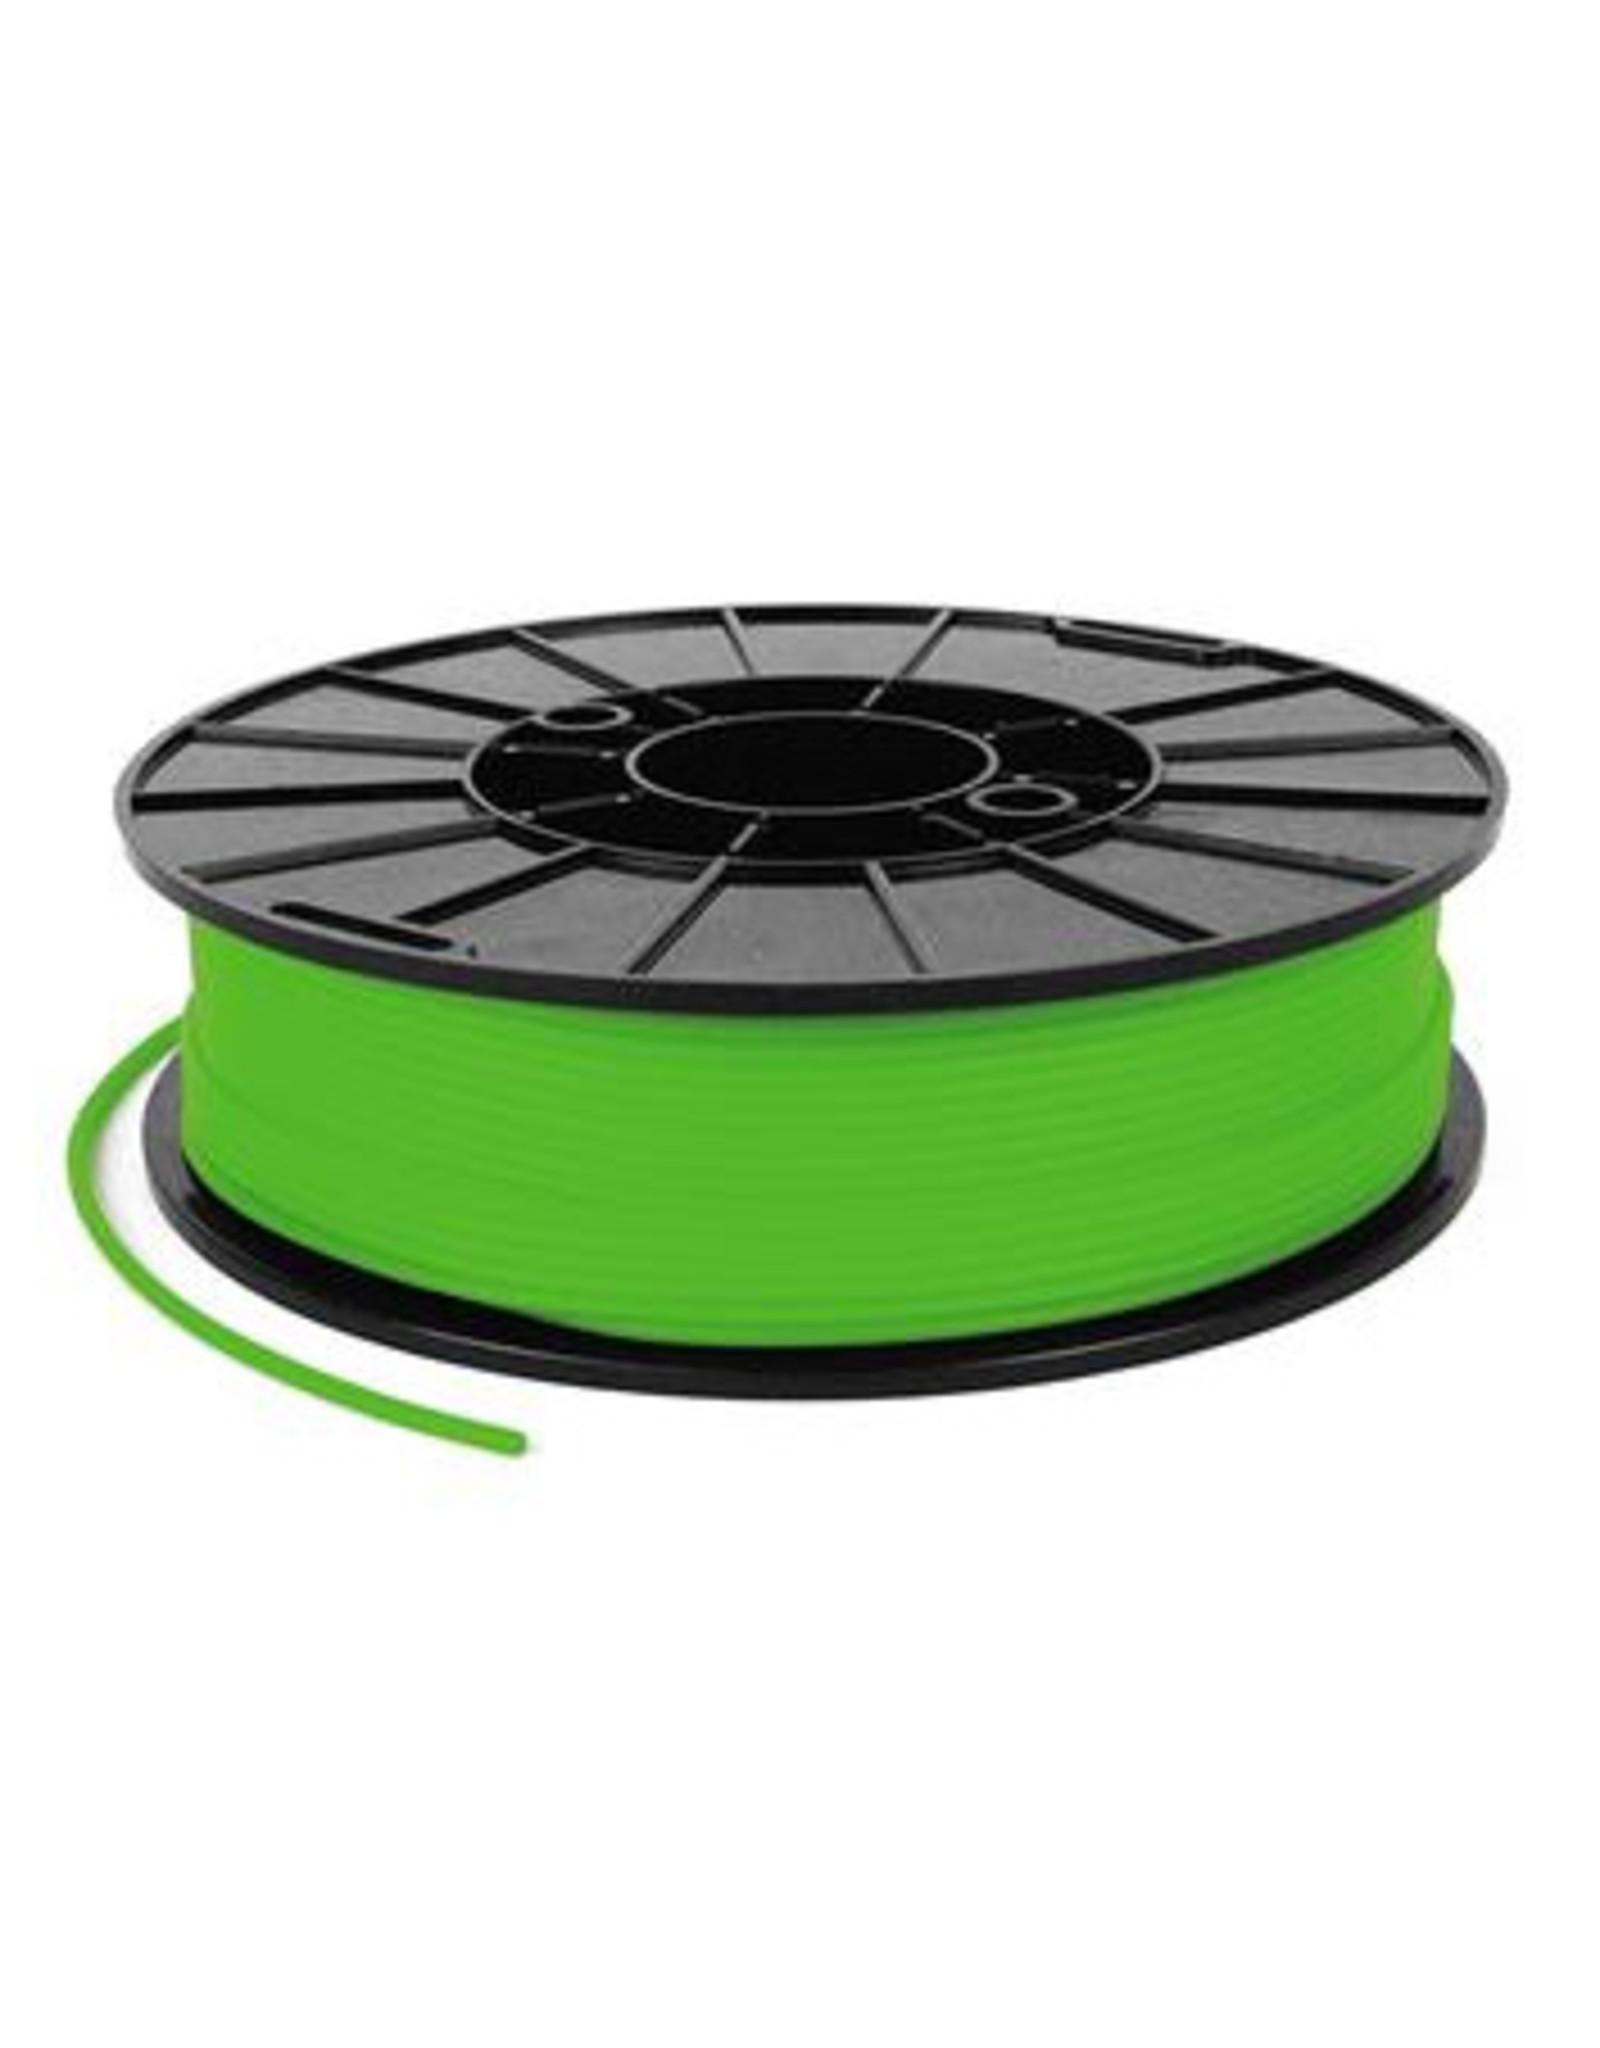 Ninja NinjaFlex Filament - 1.75mm - 0.5 kg - Vert herbe